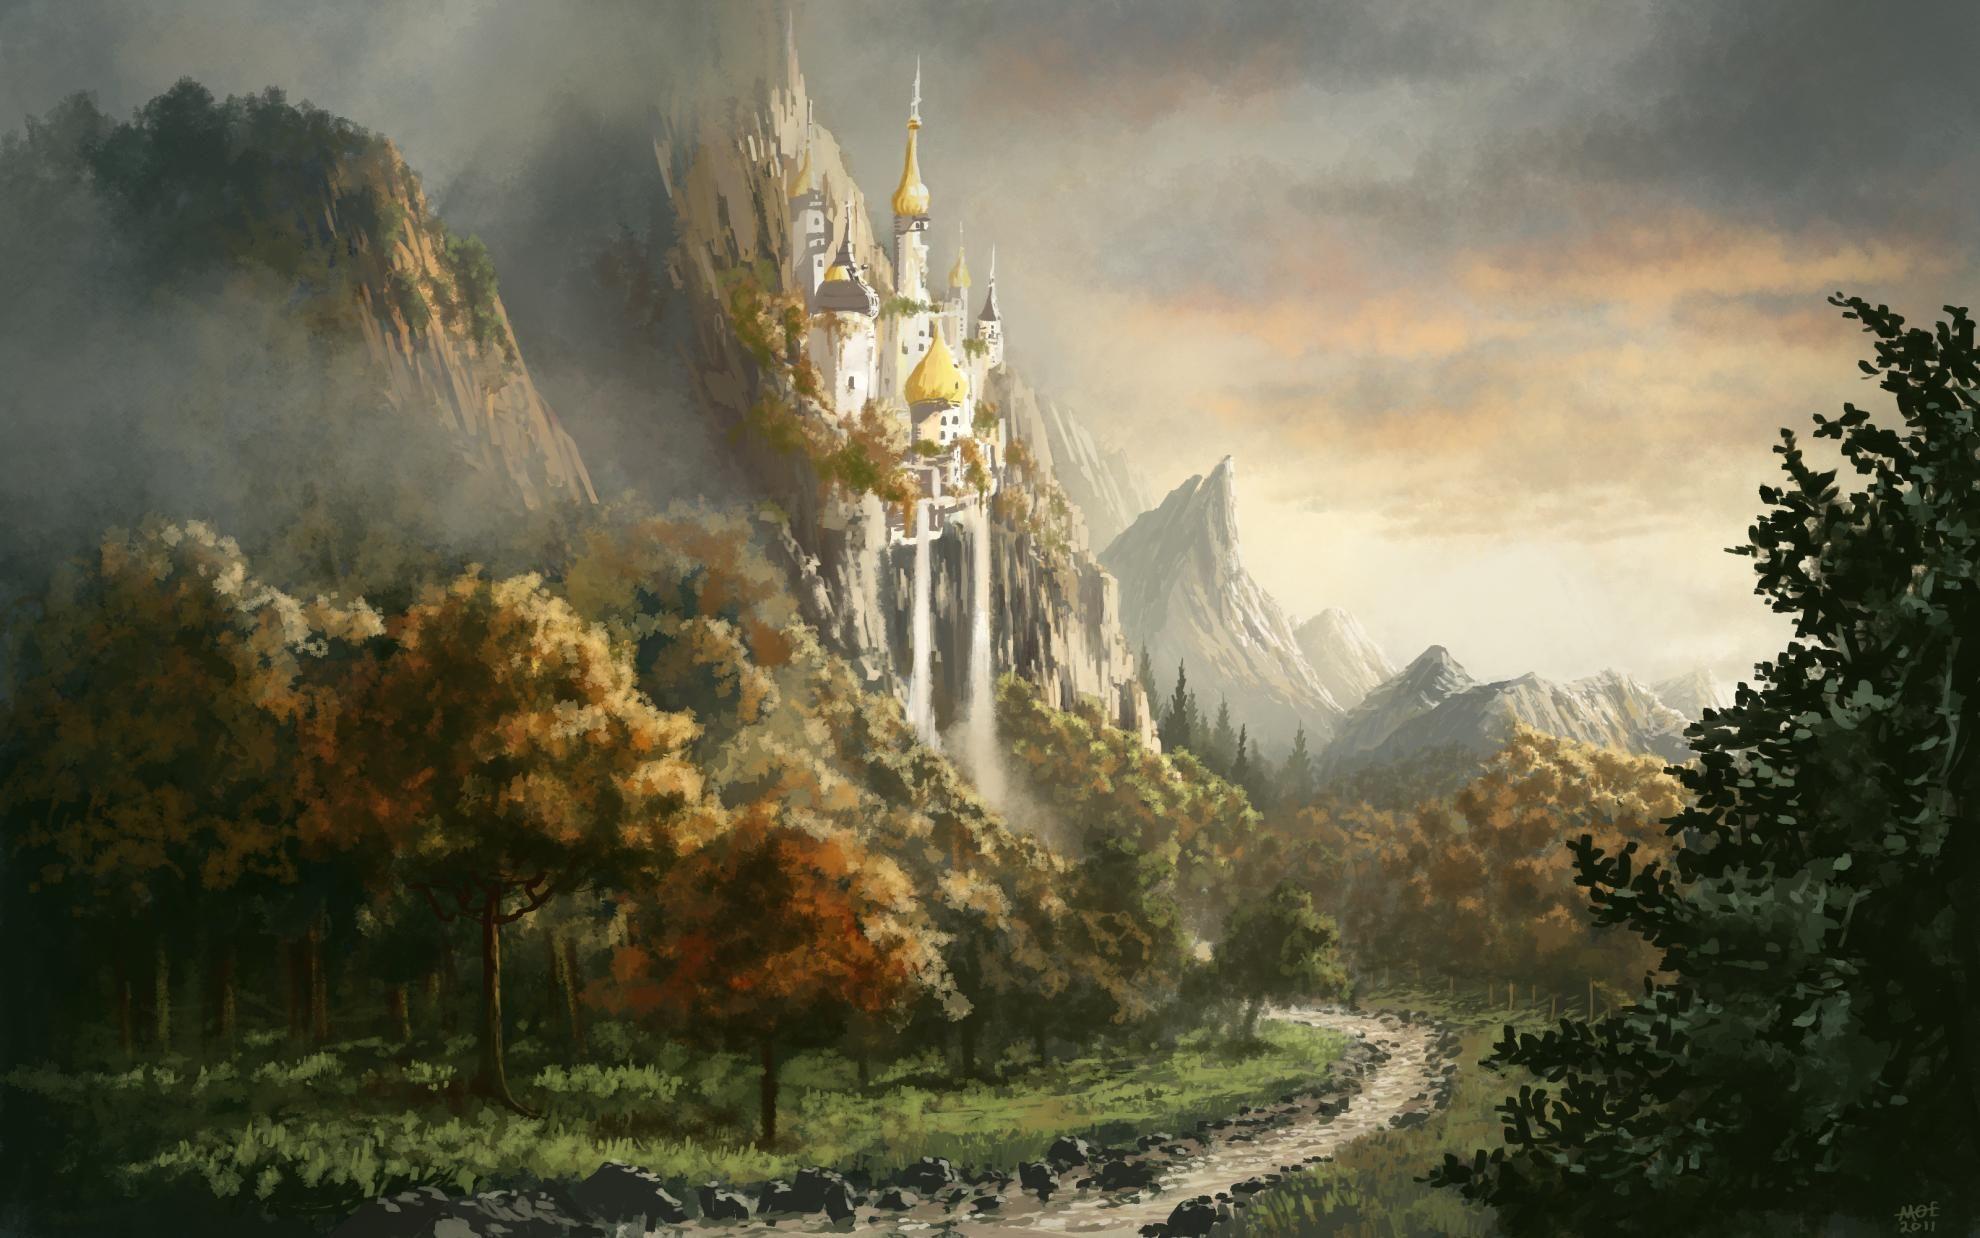 landscapes castles fantasy art - photo #16